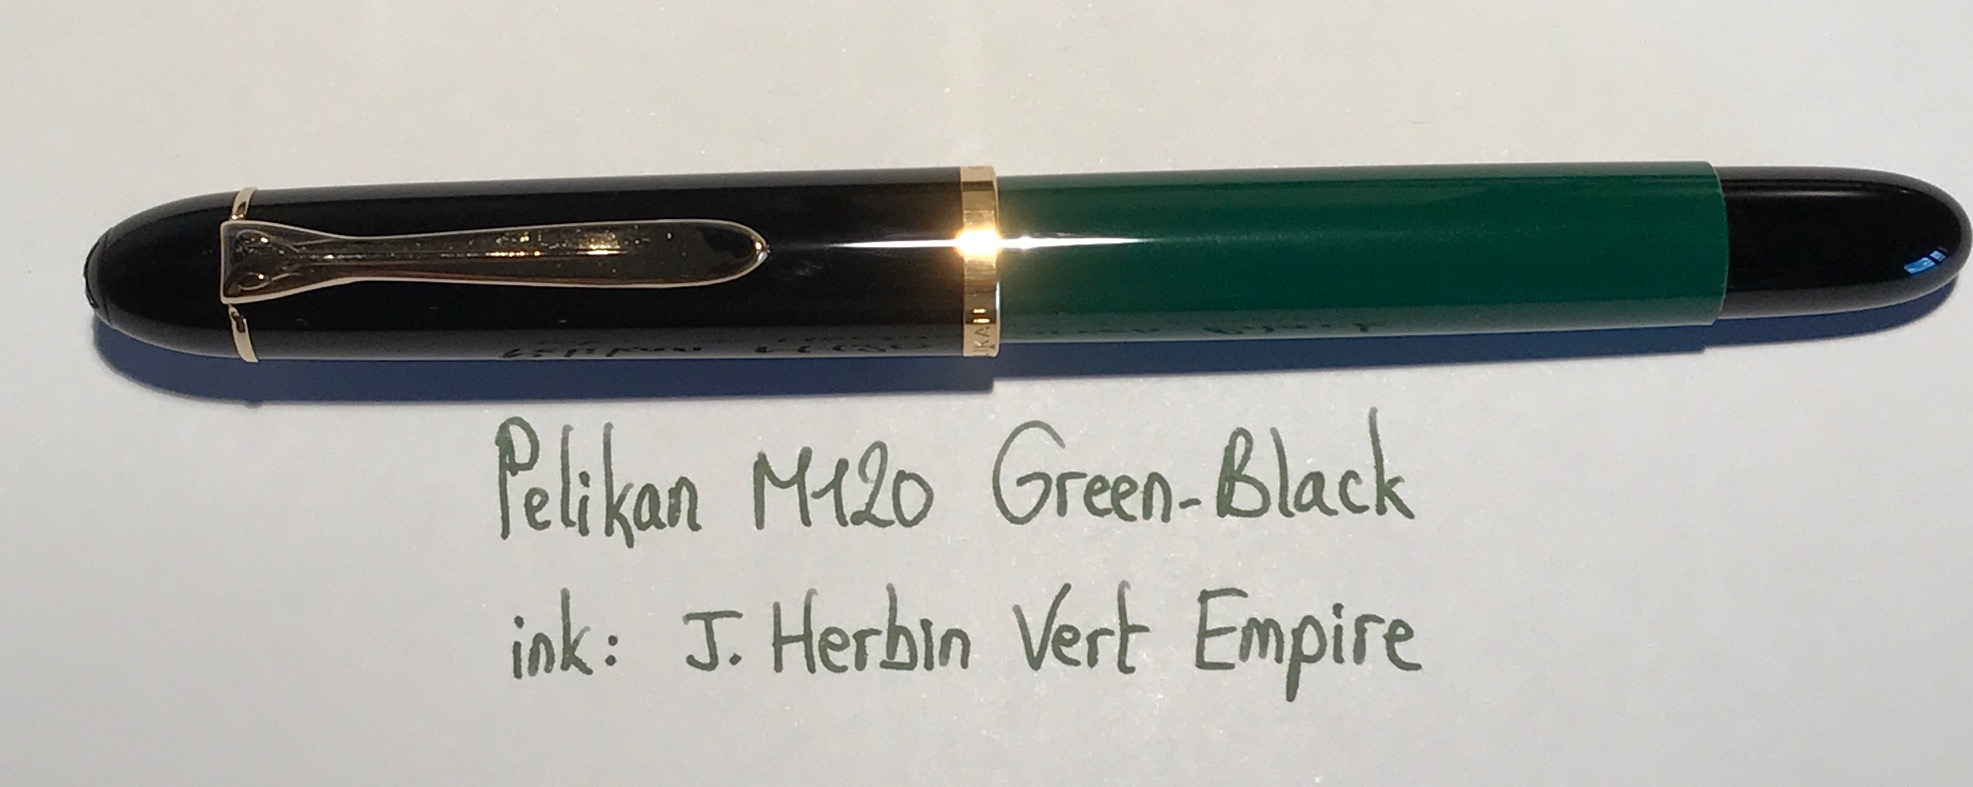 fpn_1554319143__pelikan_m120_green-black